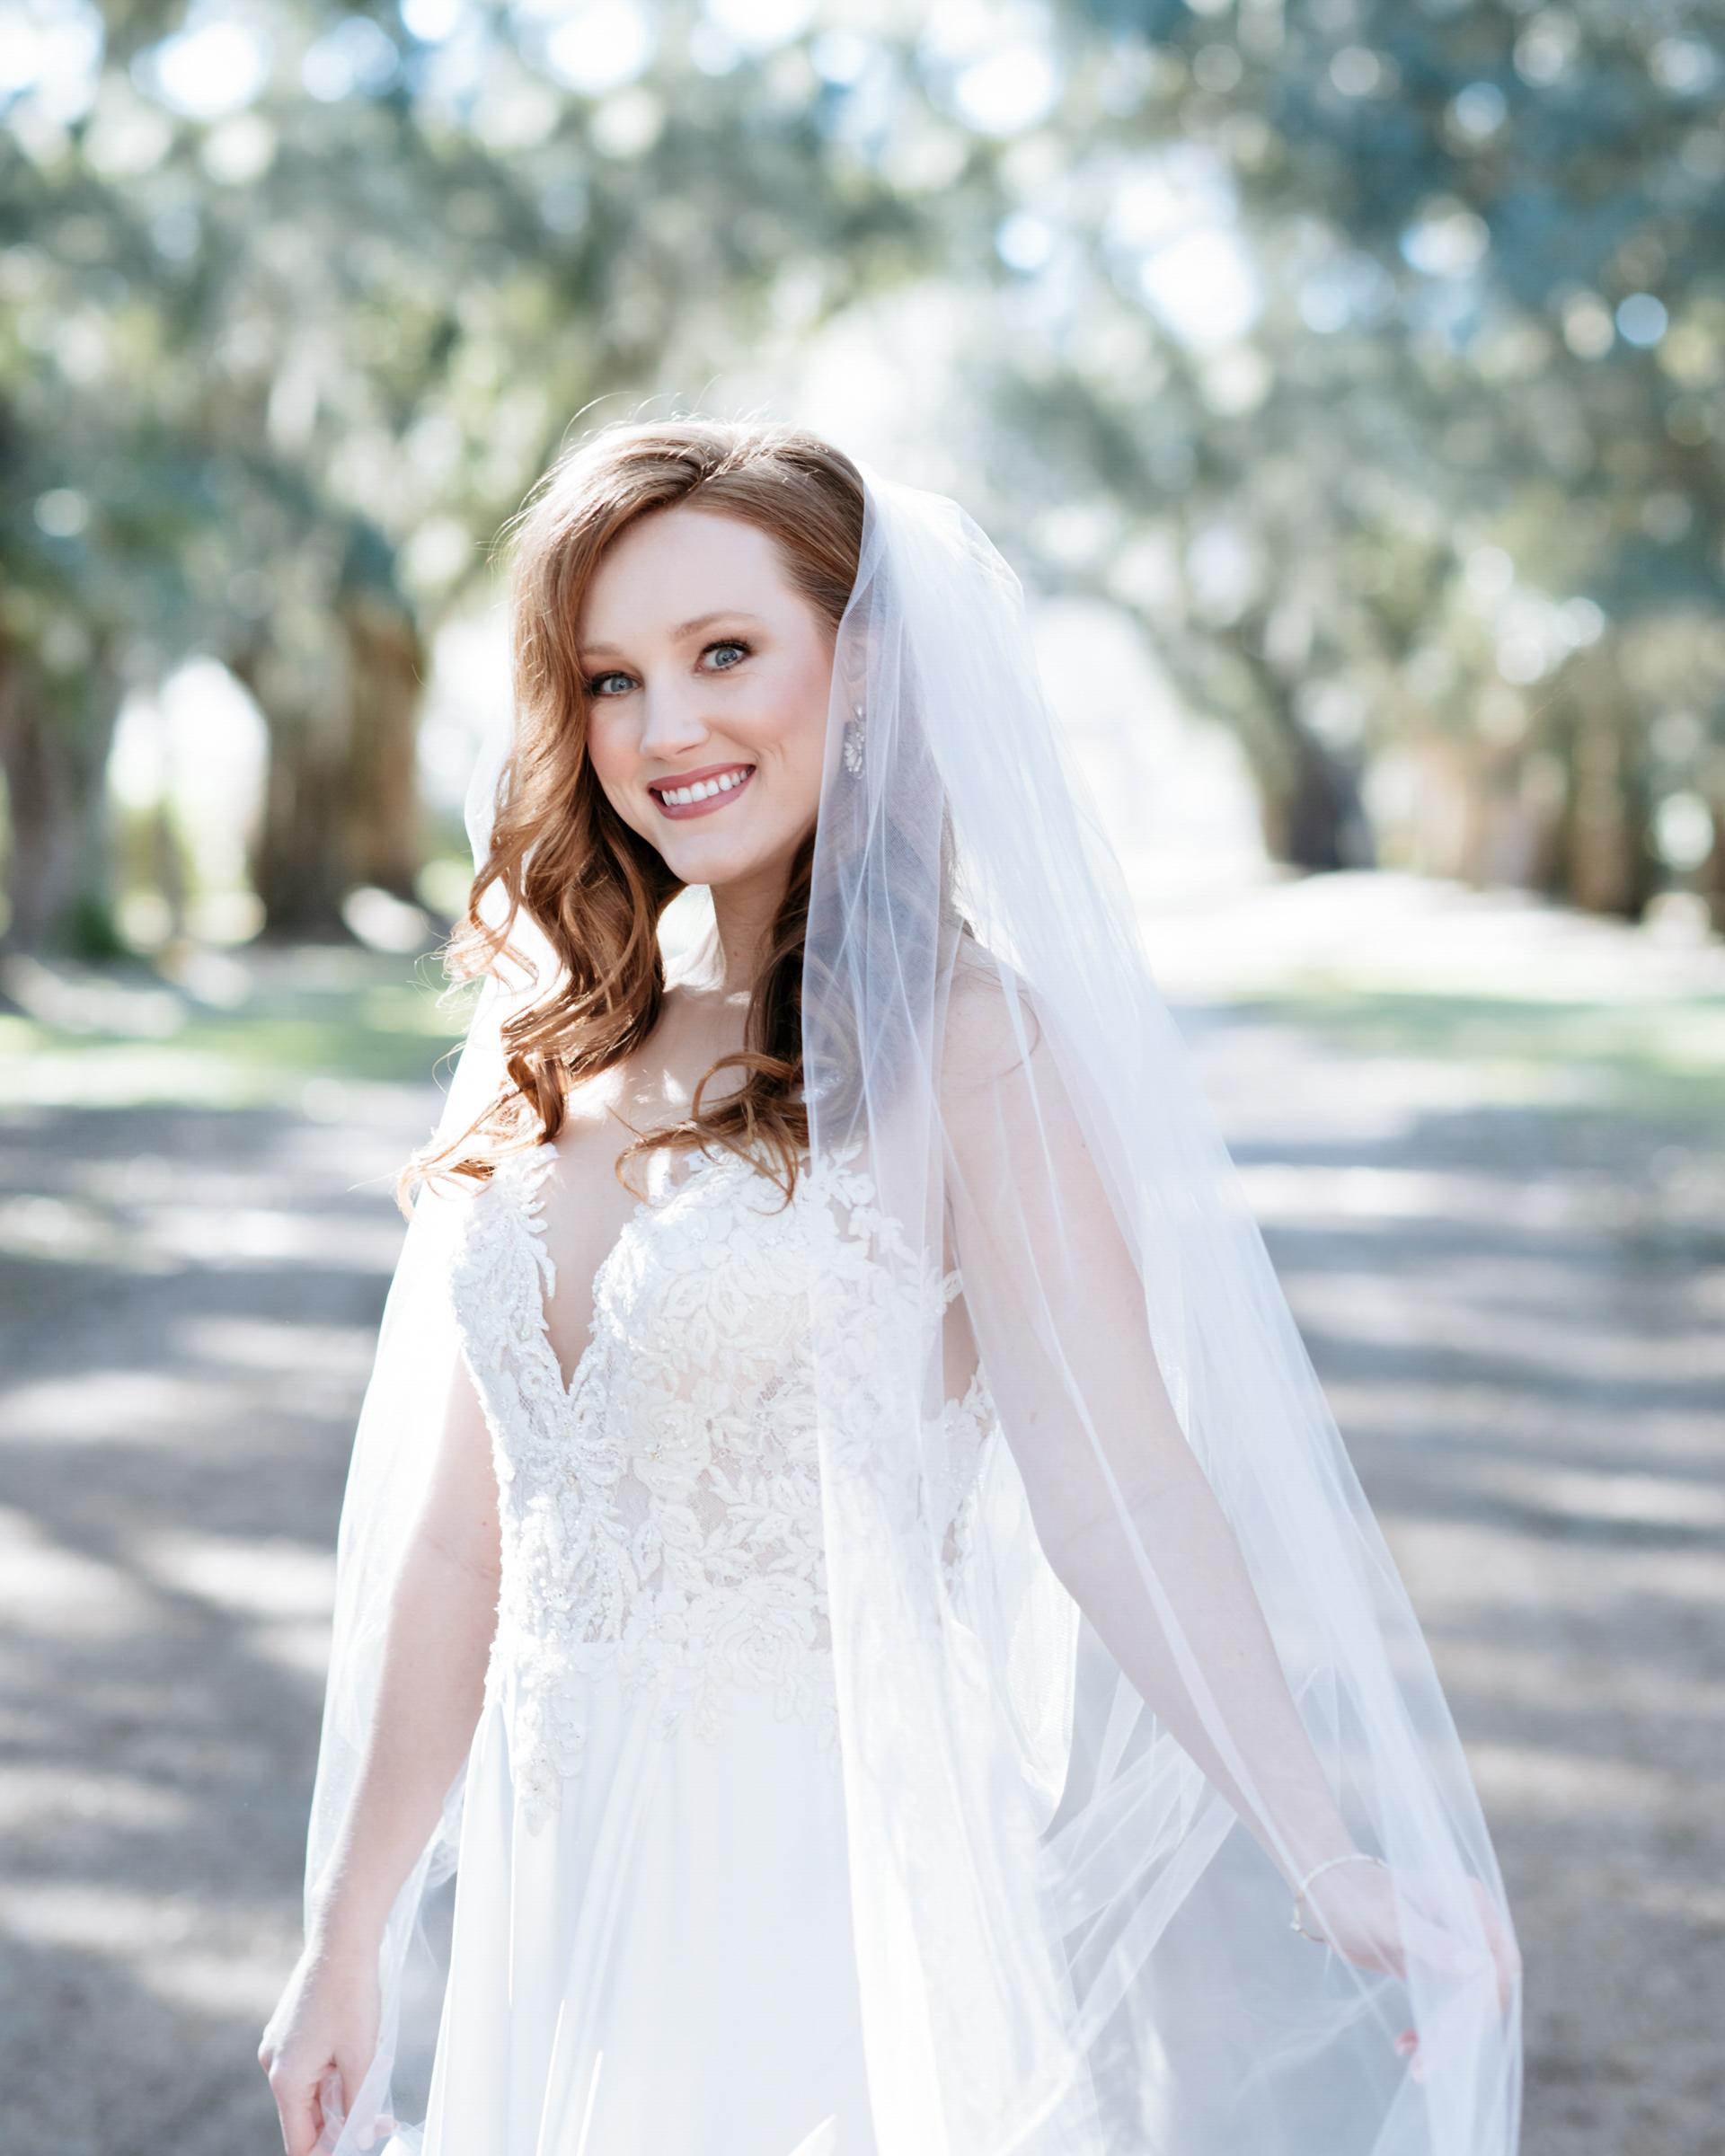 rosedown-plantation-bridal-session-portrait-701.jpg